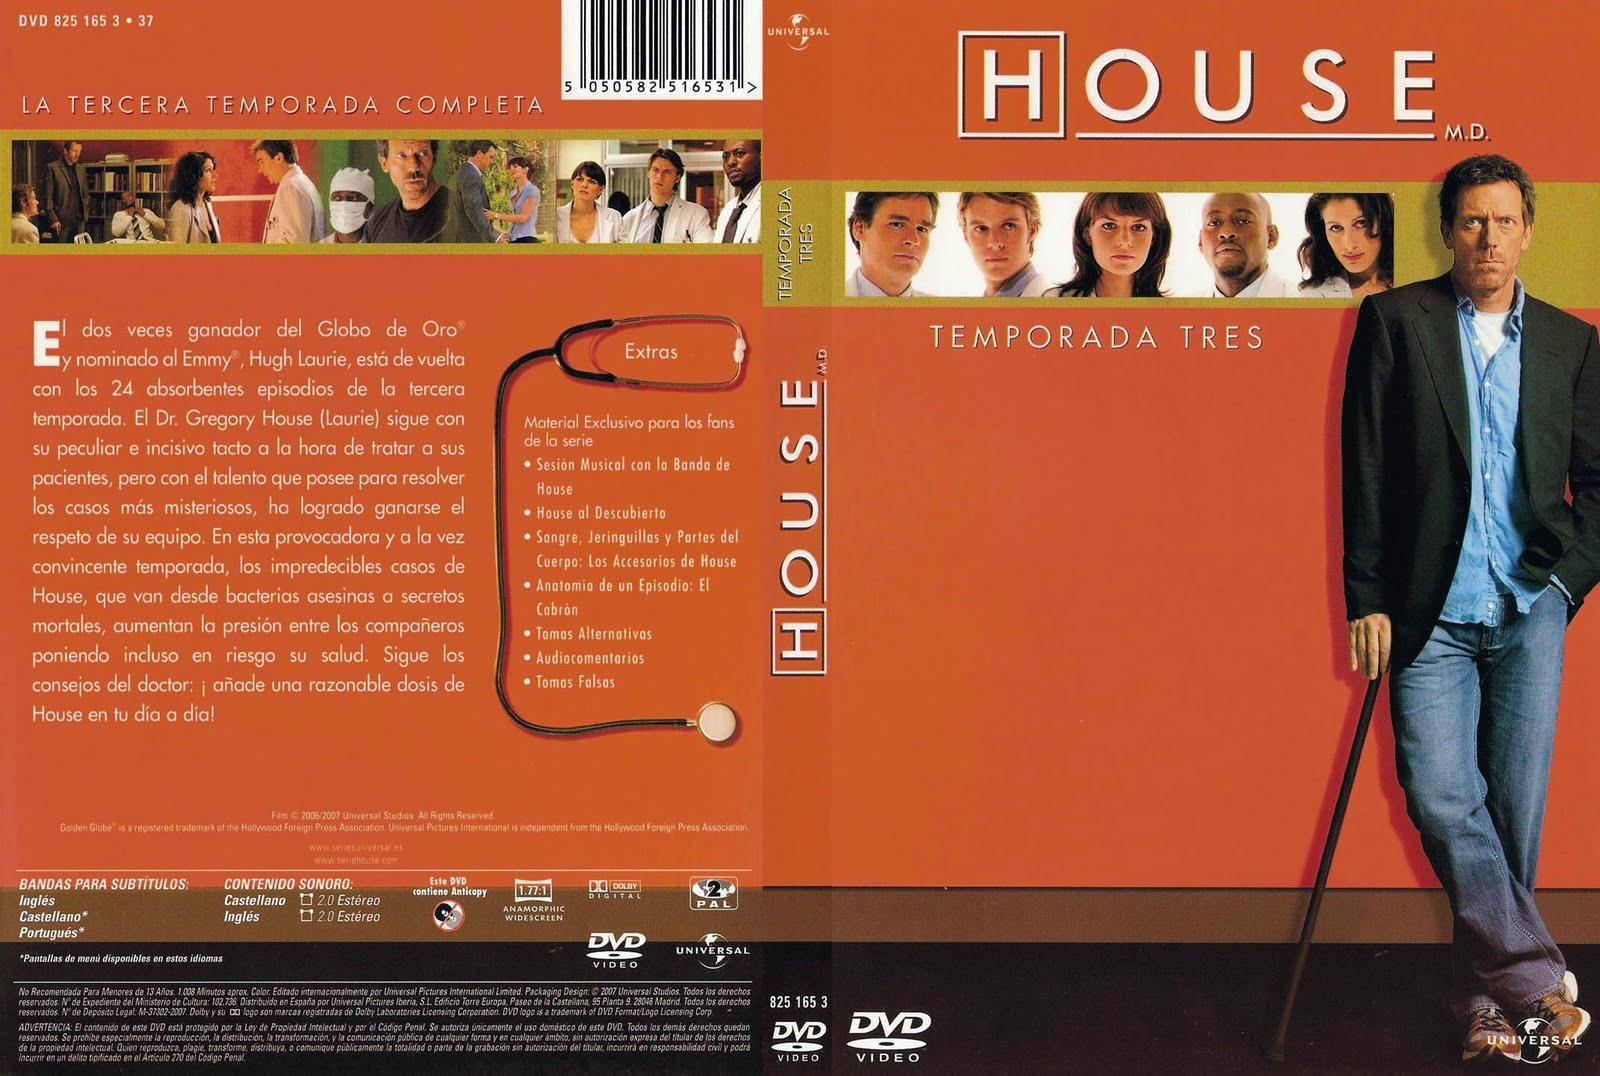 http://1.bp.blogspot.com/_JkxNmckAb2E/St82nmDli8I/AAAAAAAAA1k/s0qcEW_f9yo/s1600/House%2Btercera%2Btemporada.jpg